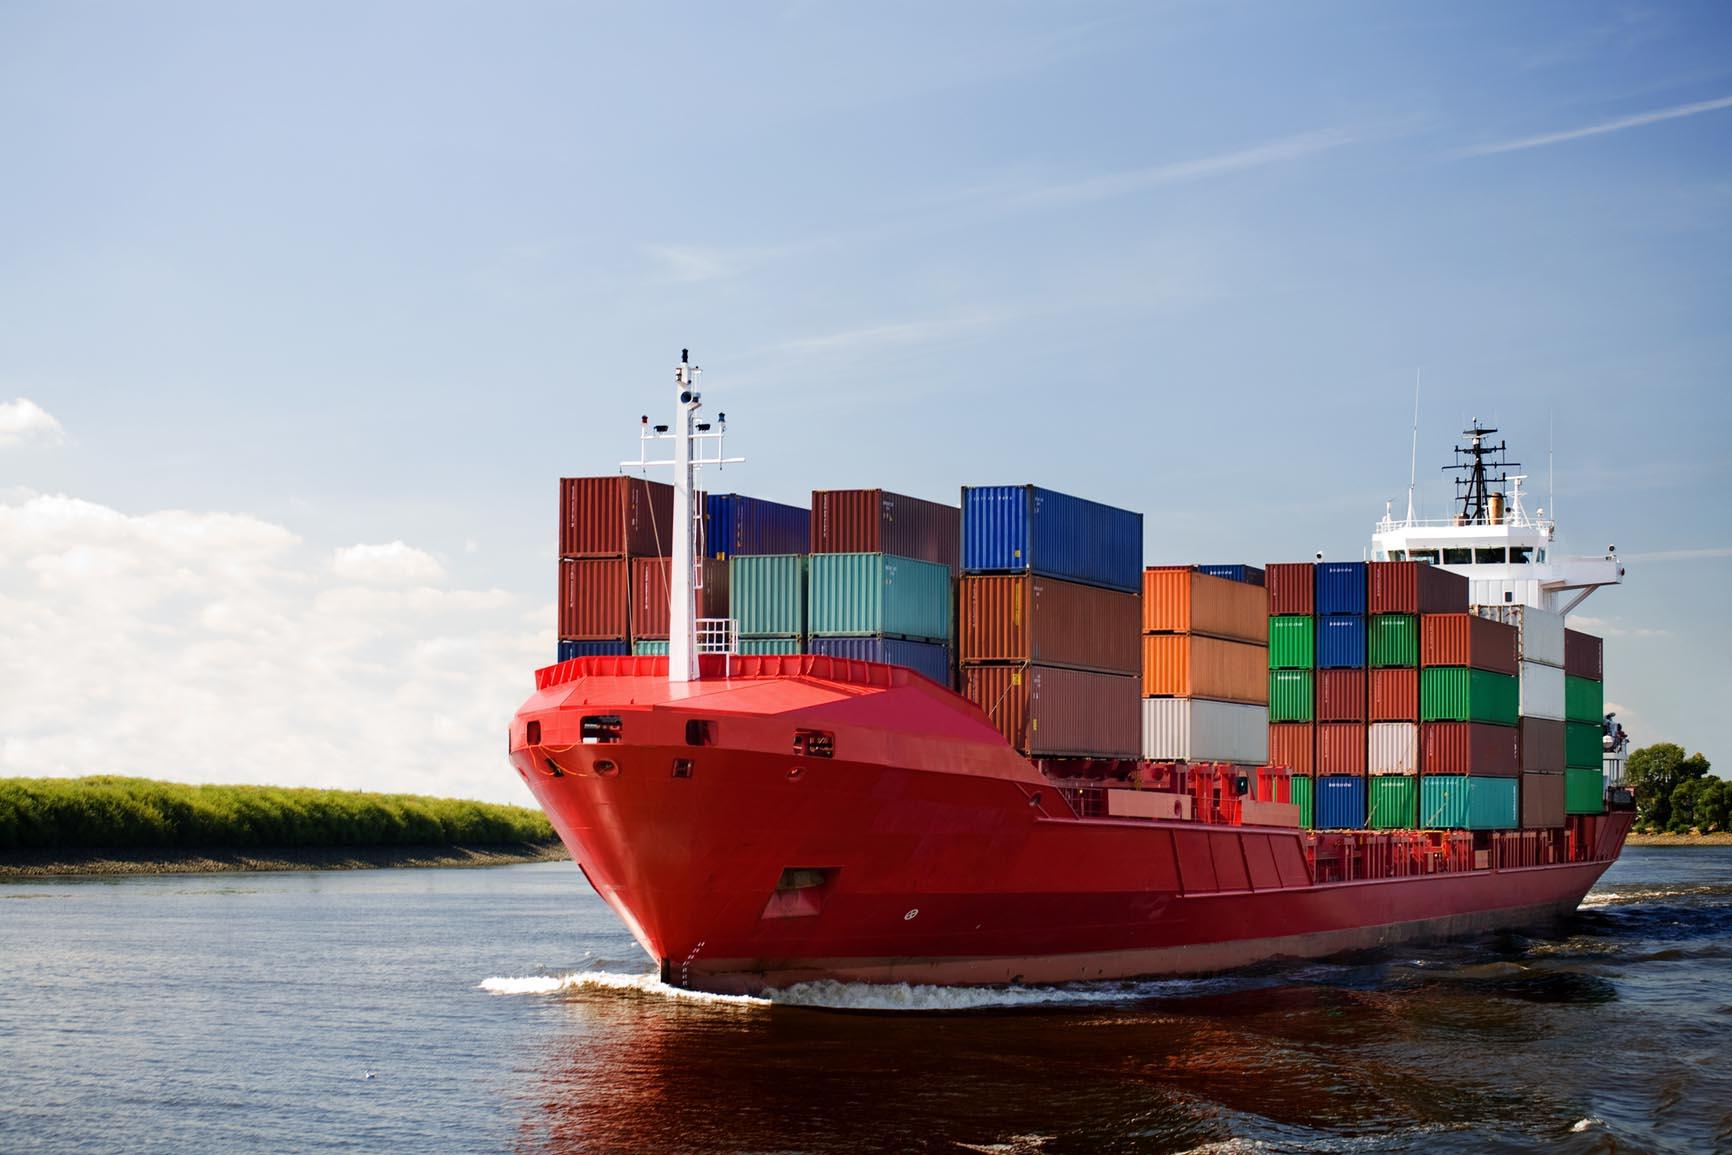 shipping-image-467b9c66b8e986a6cf51887a135226f8.jpg